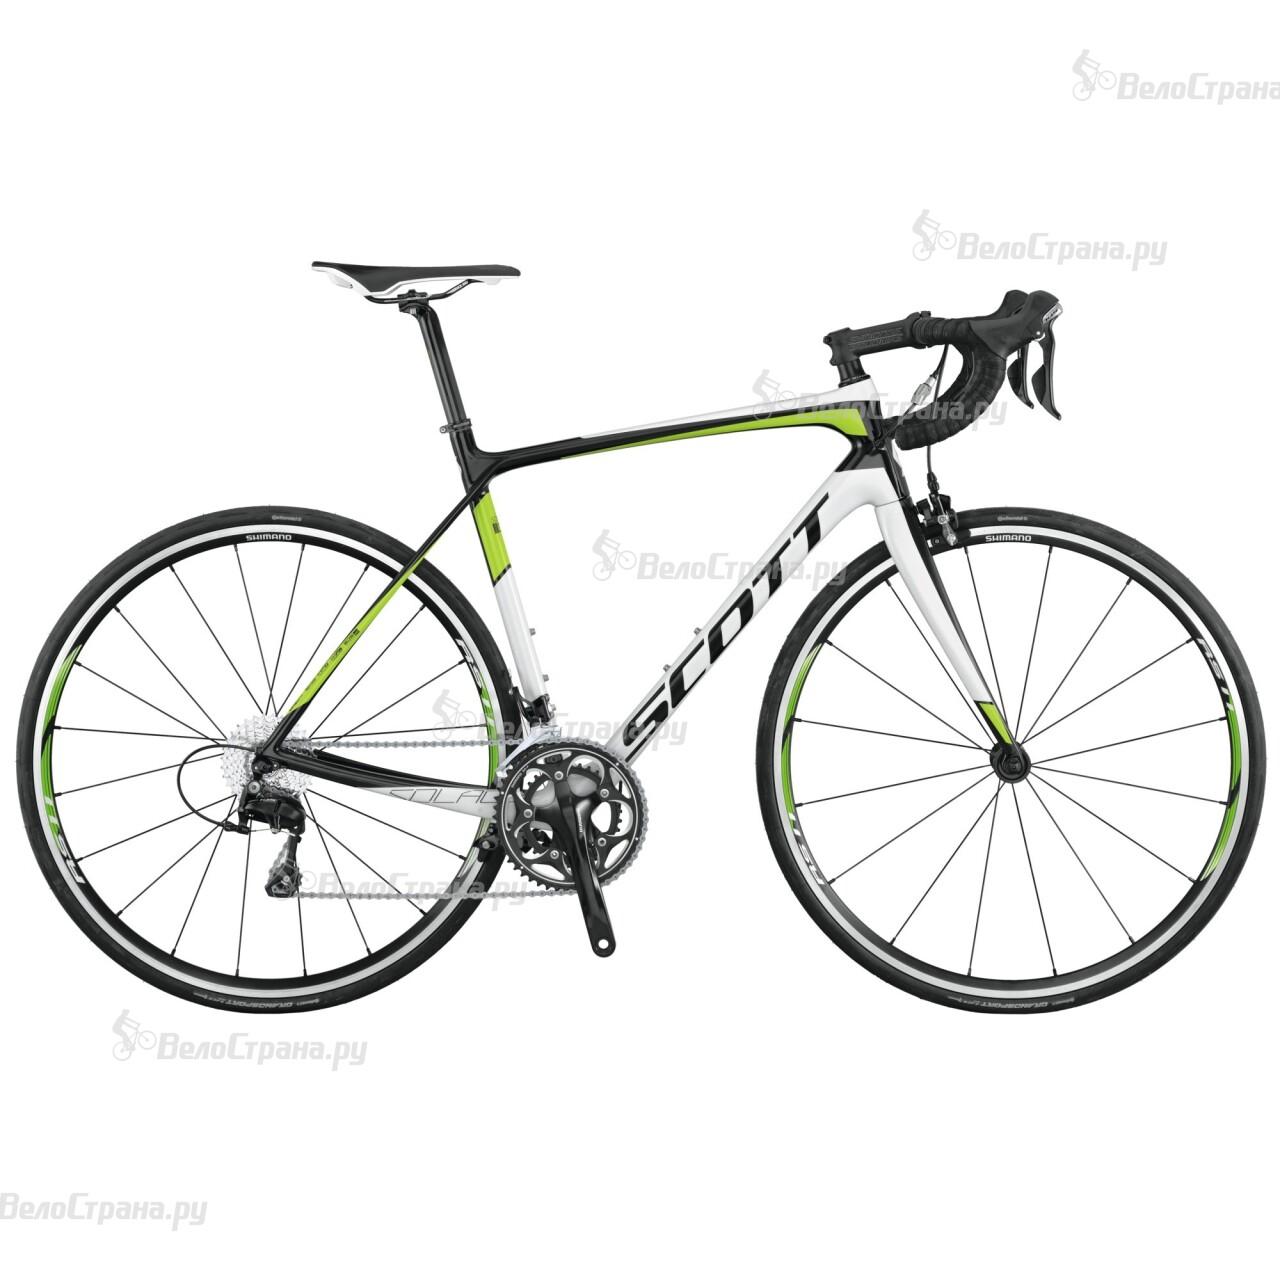 Велосипед Scott Solace 30 (2015) велосипед scott contessa solace 15 compact 2015